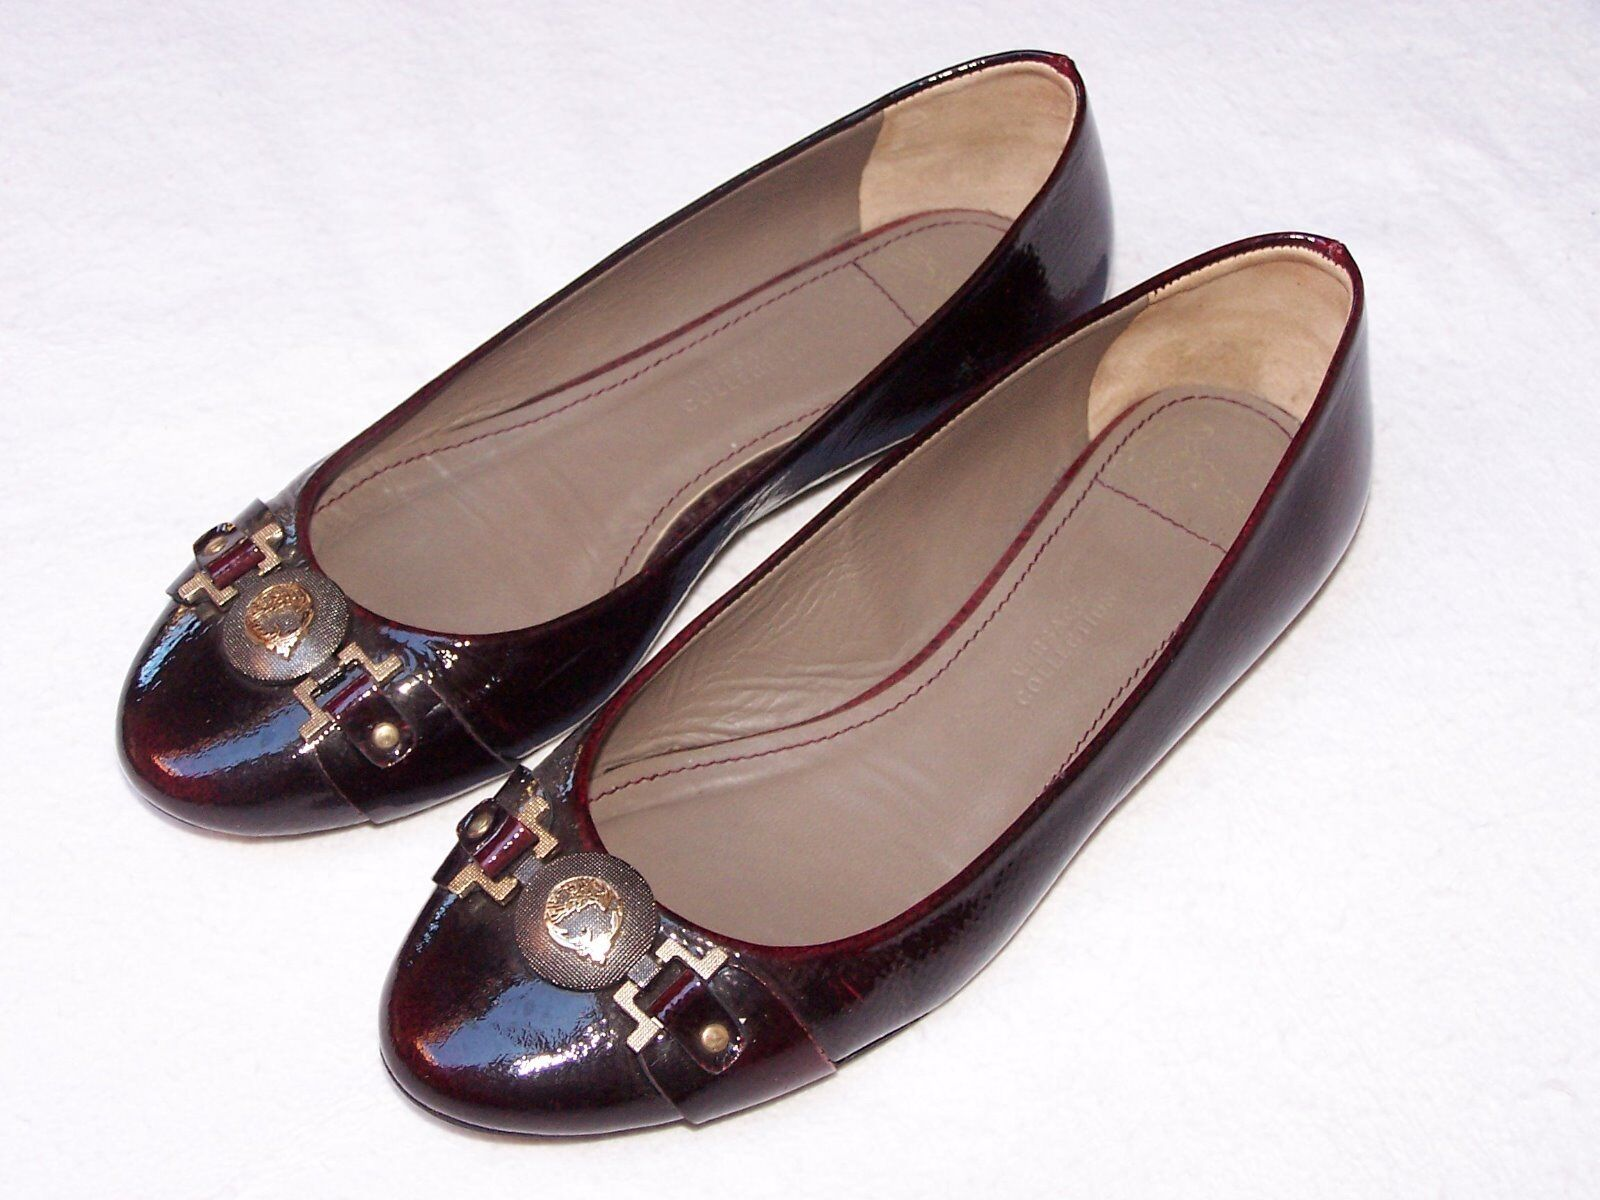 RIBASSO-REGALO    shoes VERSACE women  BALLERINE